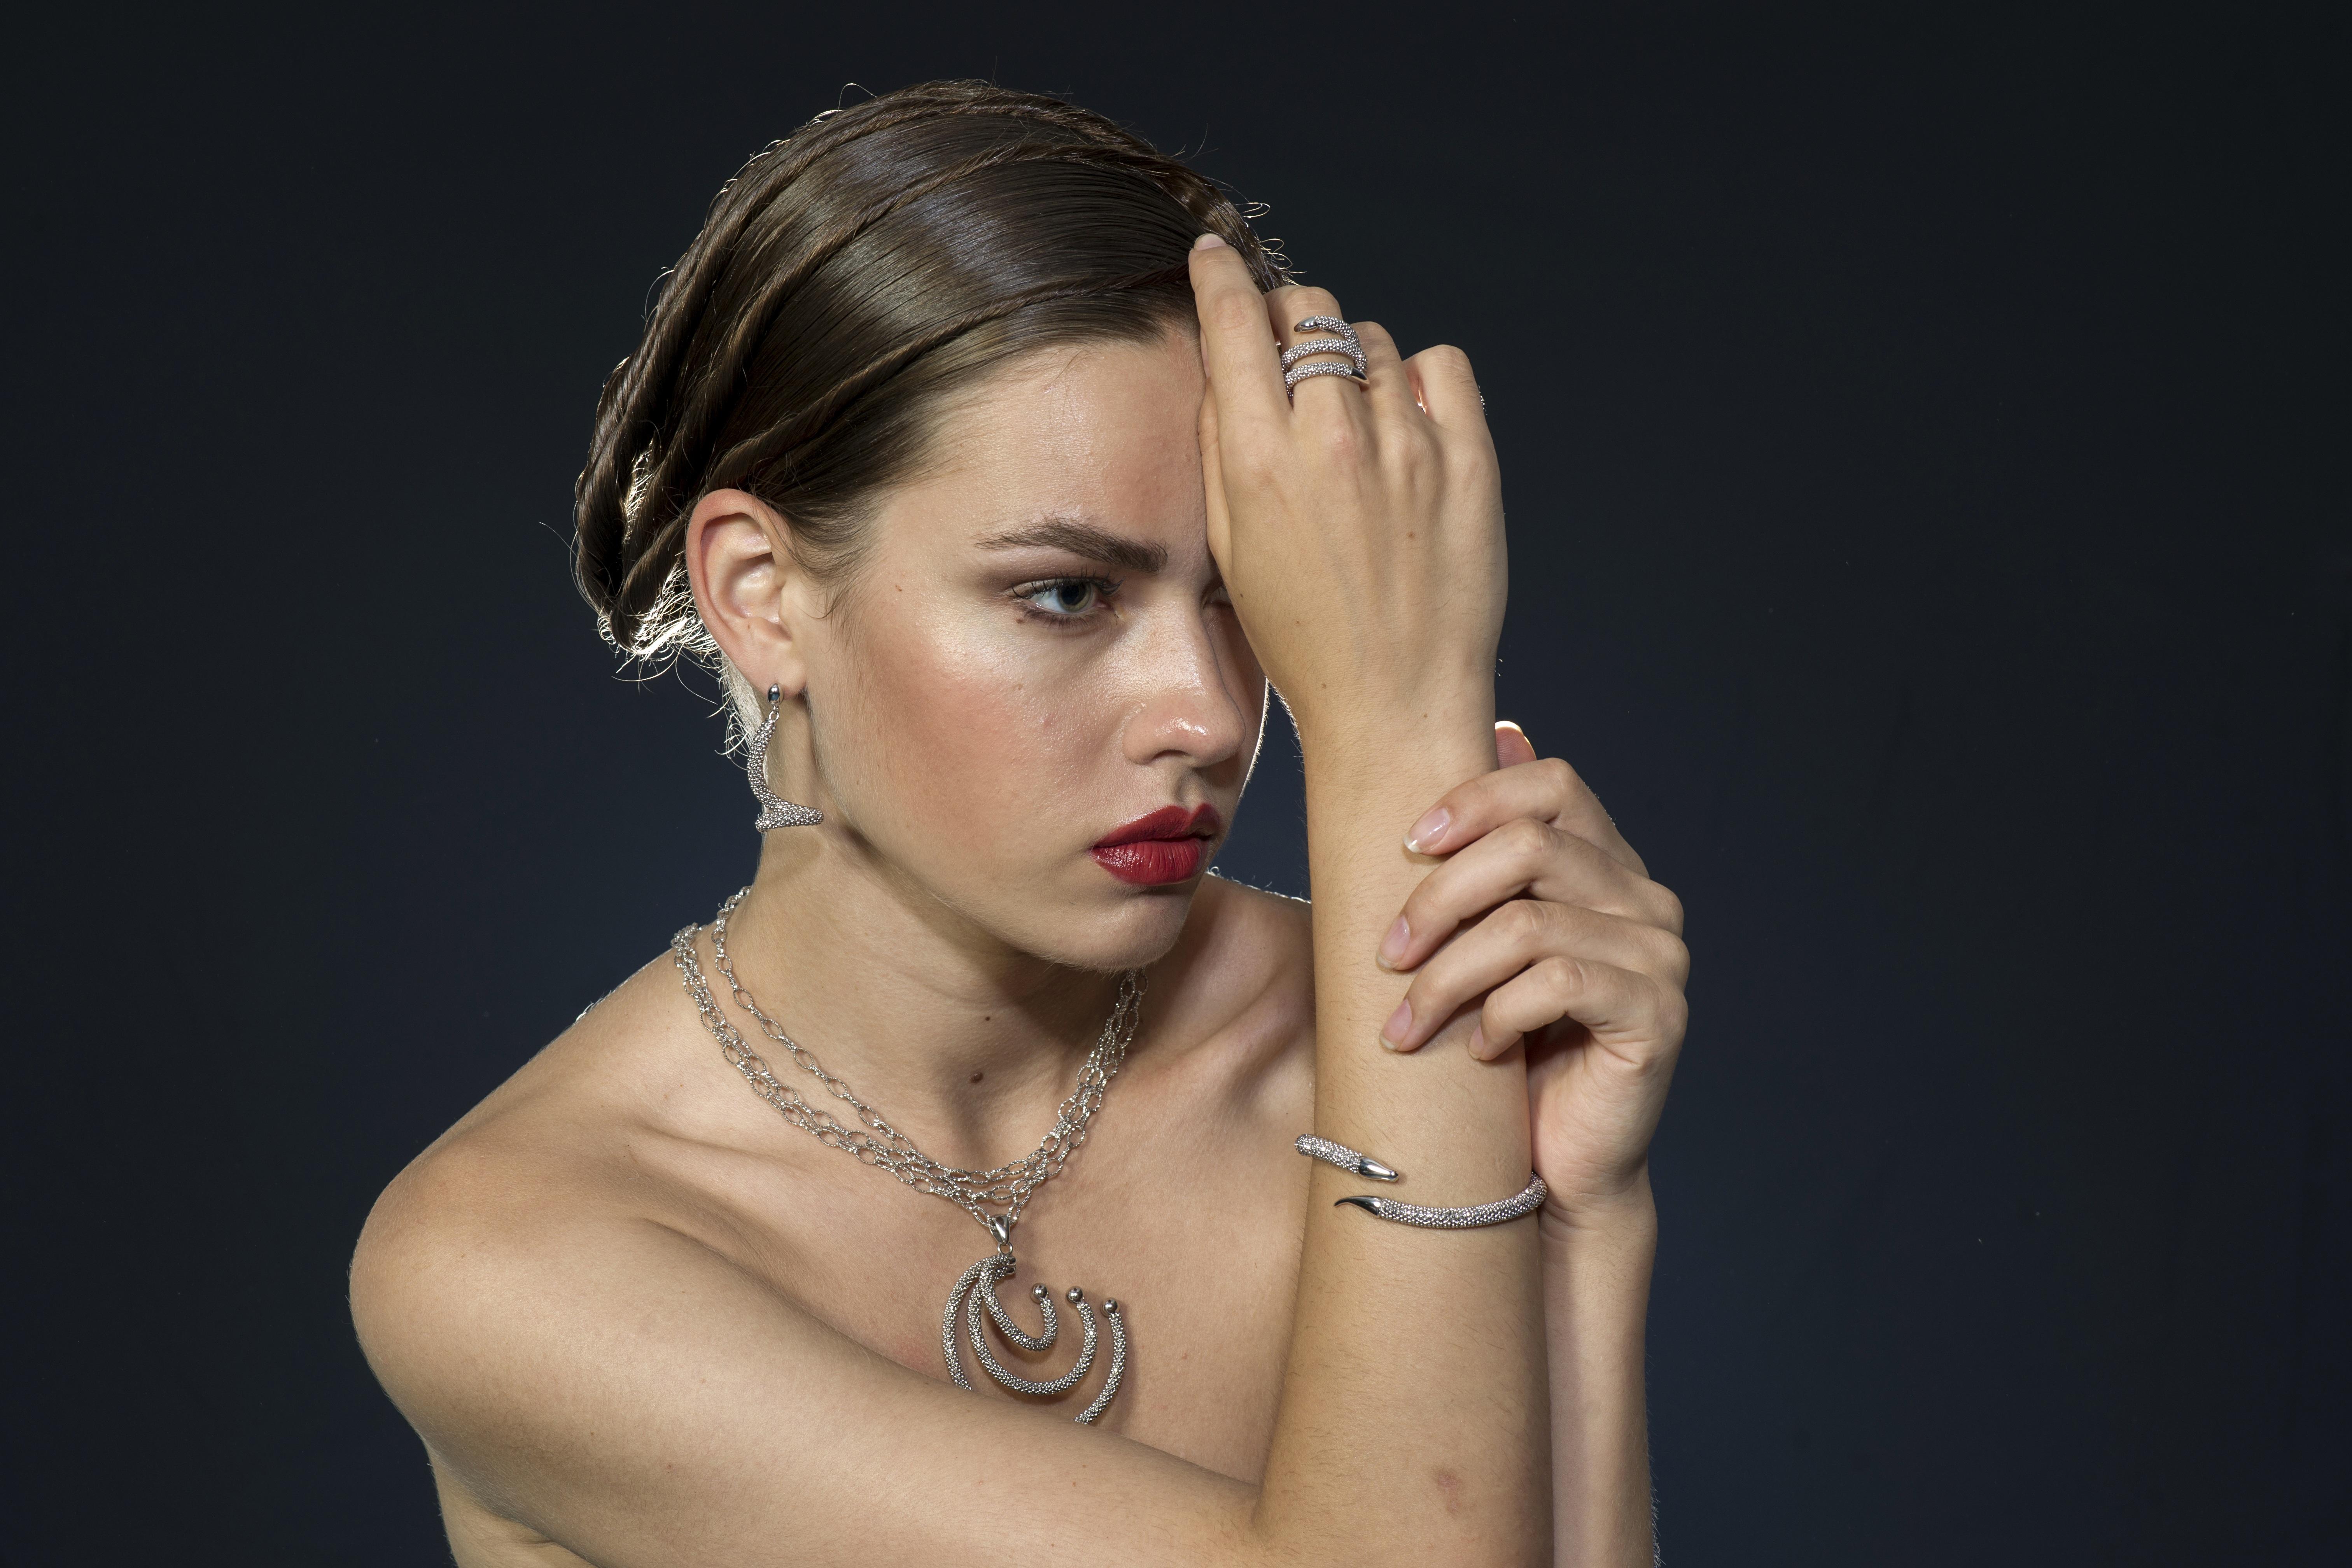 Junge Frau ohne Tattoo dank Laser - nachher